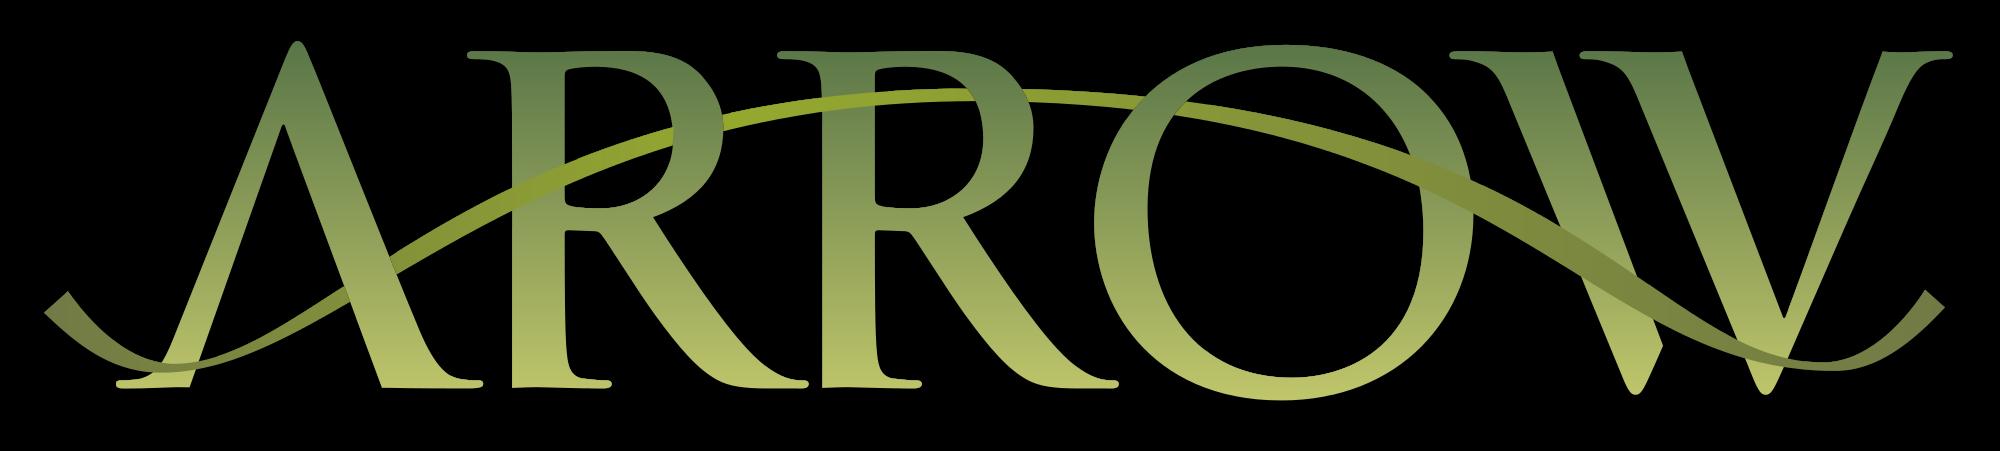 Logo Arrow PNG - 103552